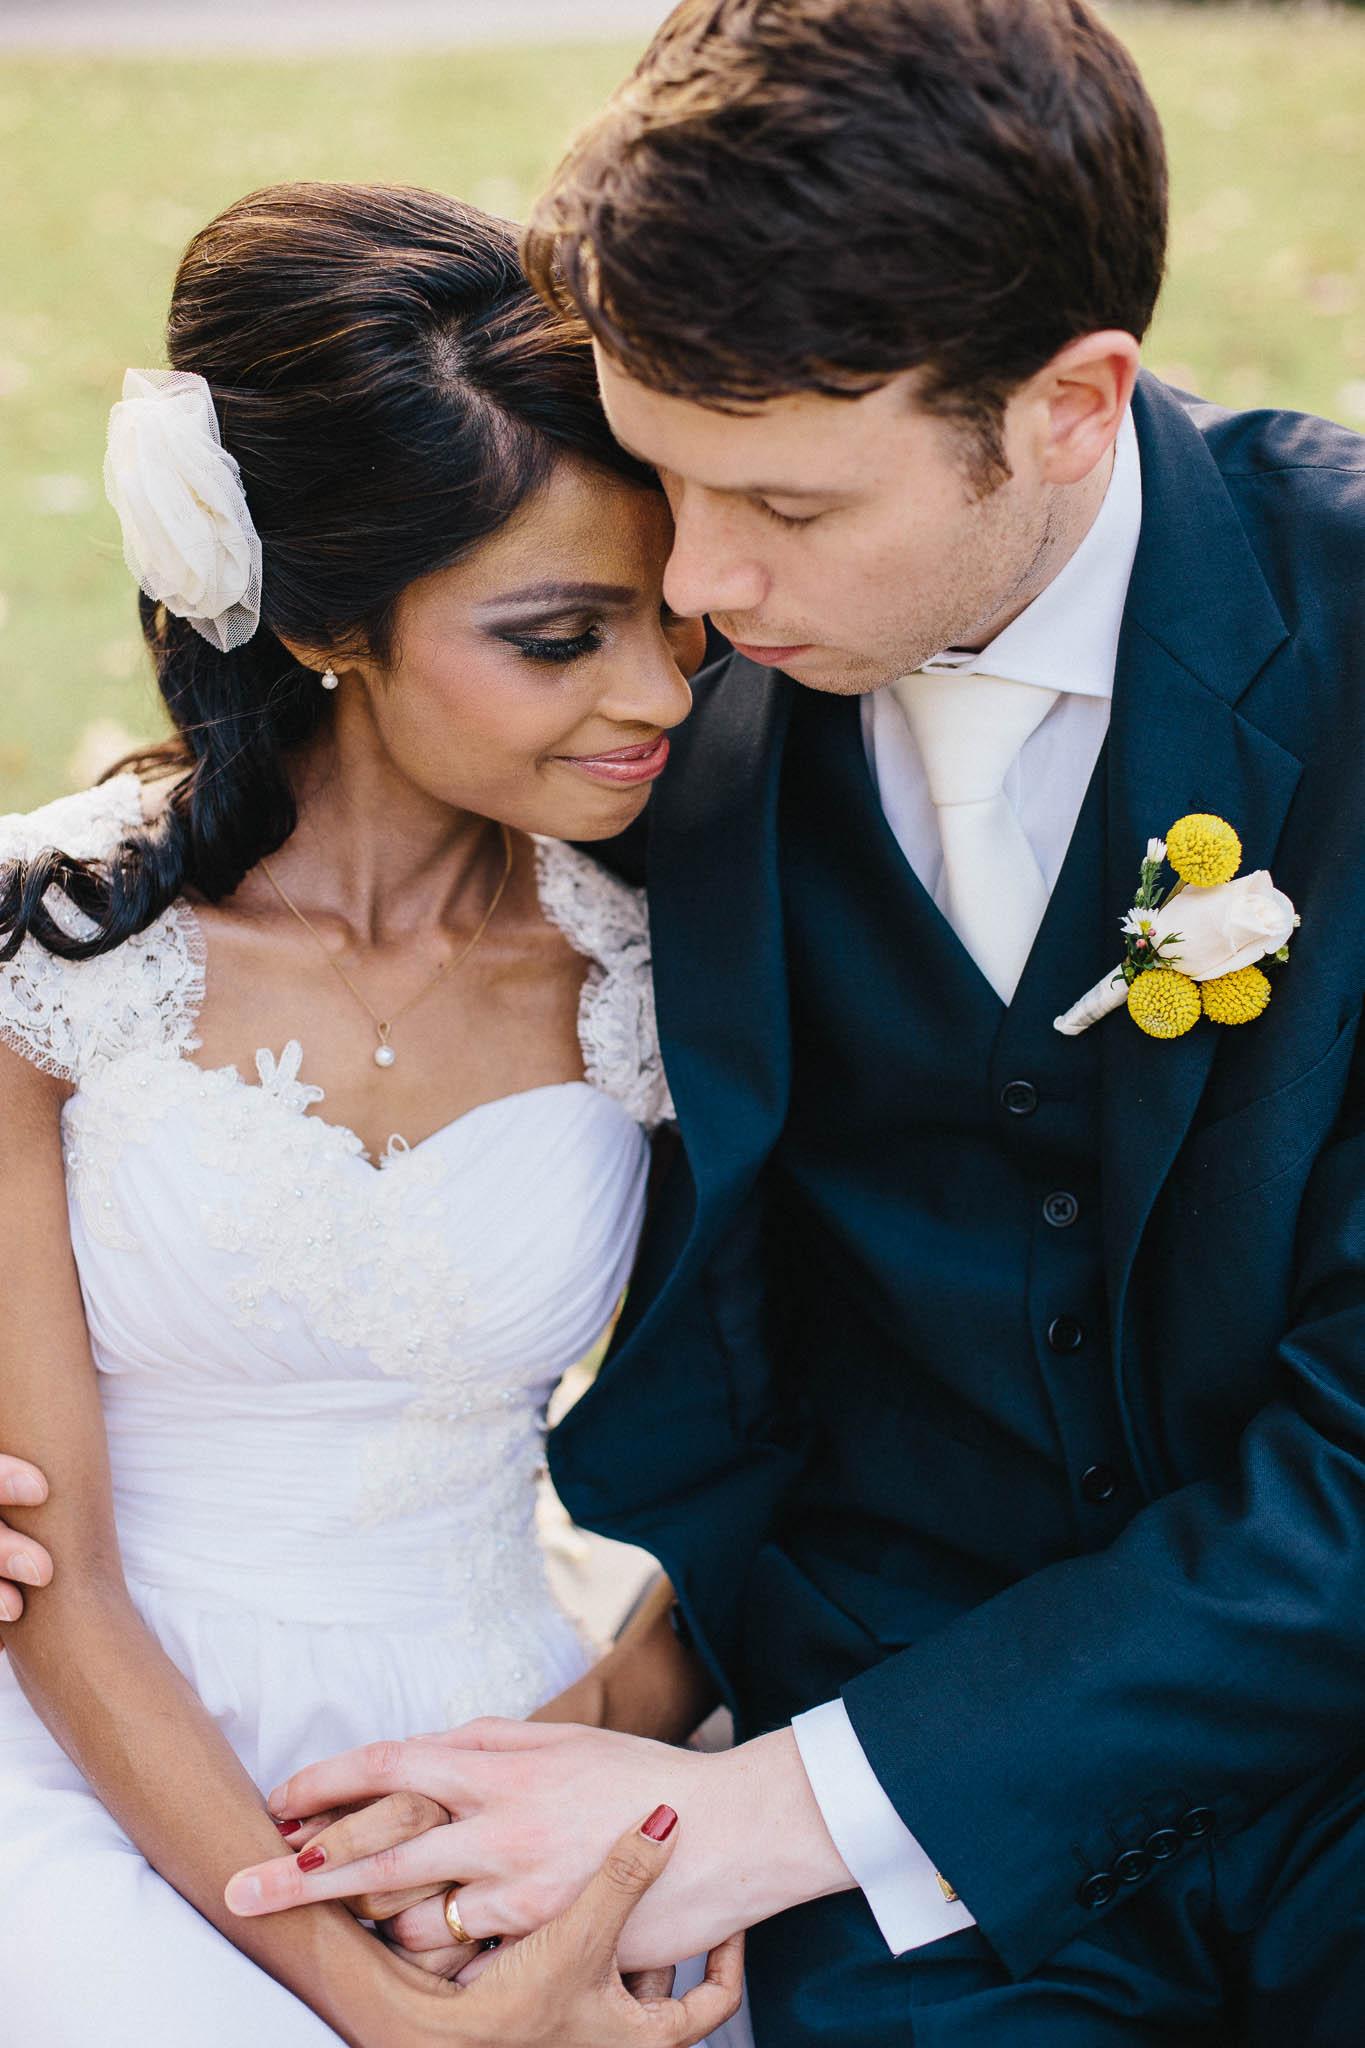 singapore-wedding-photographer-st-andrews-cathedral-renita-david-51.jpg